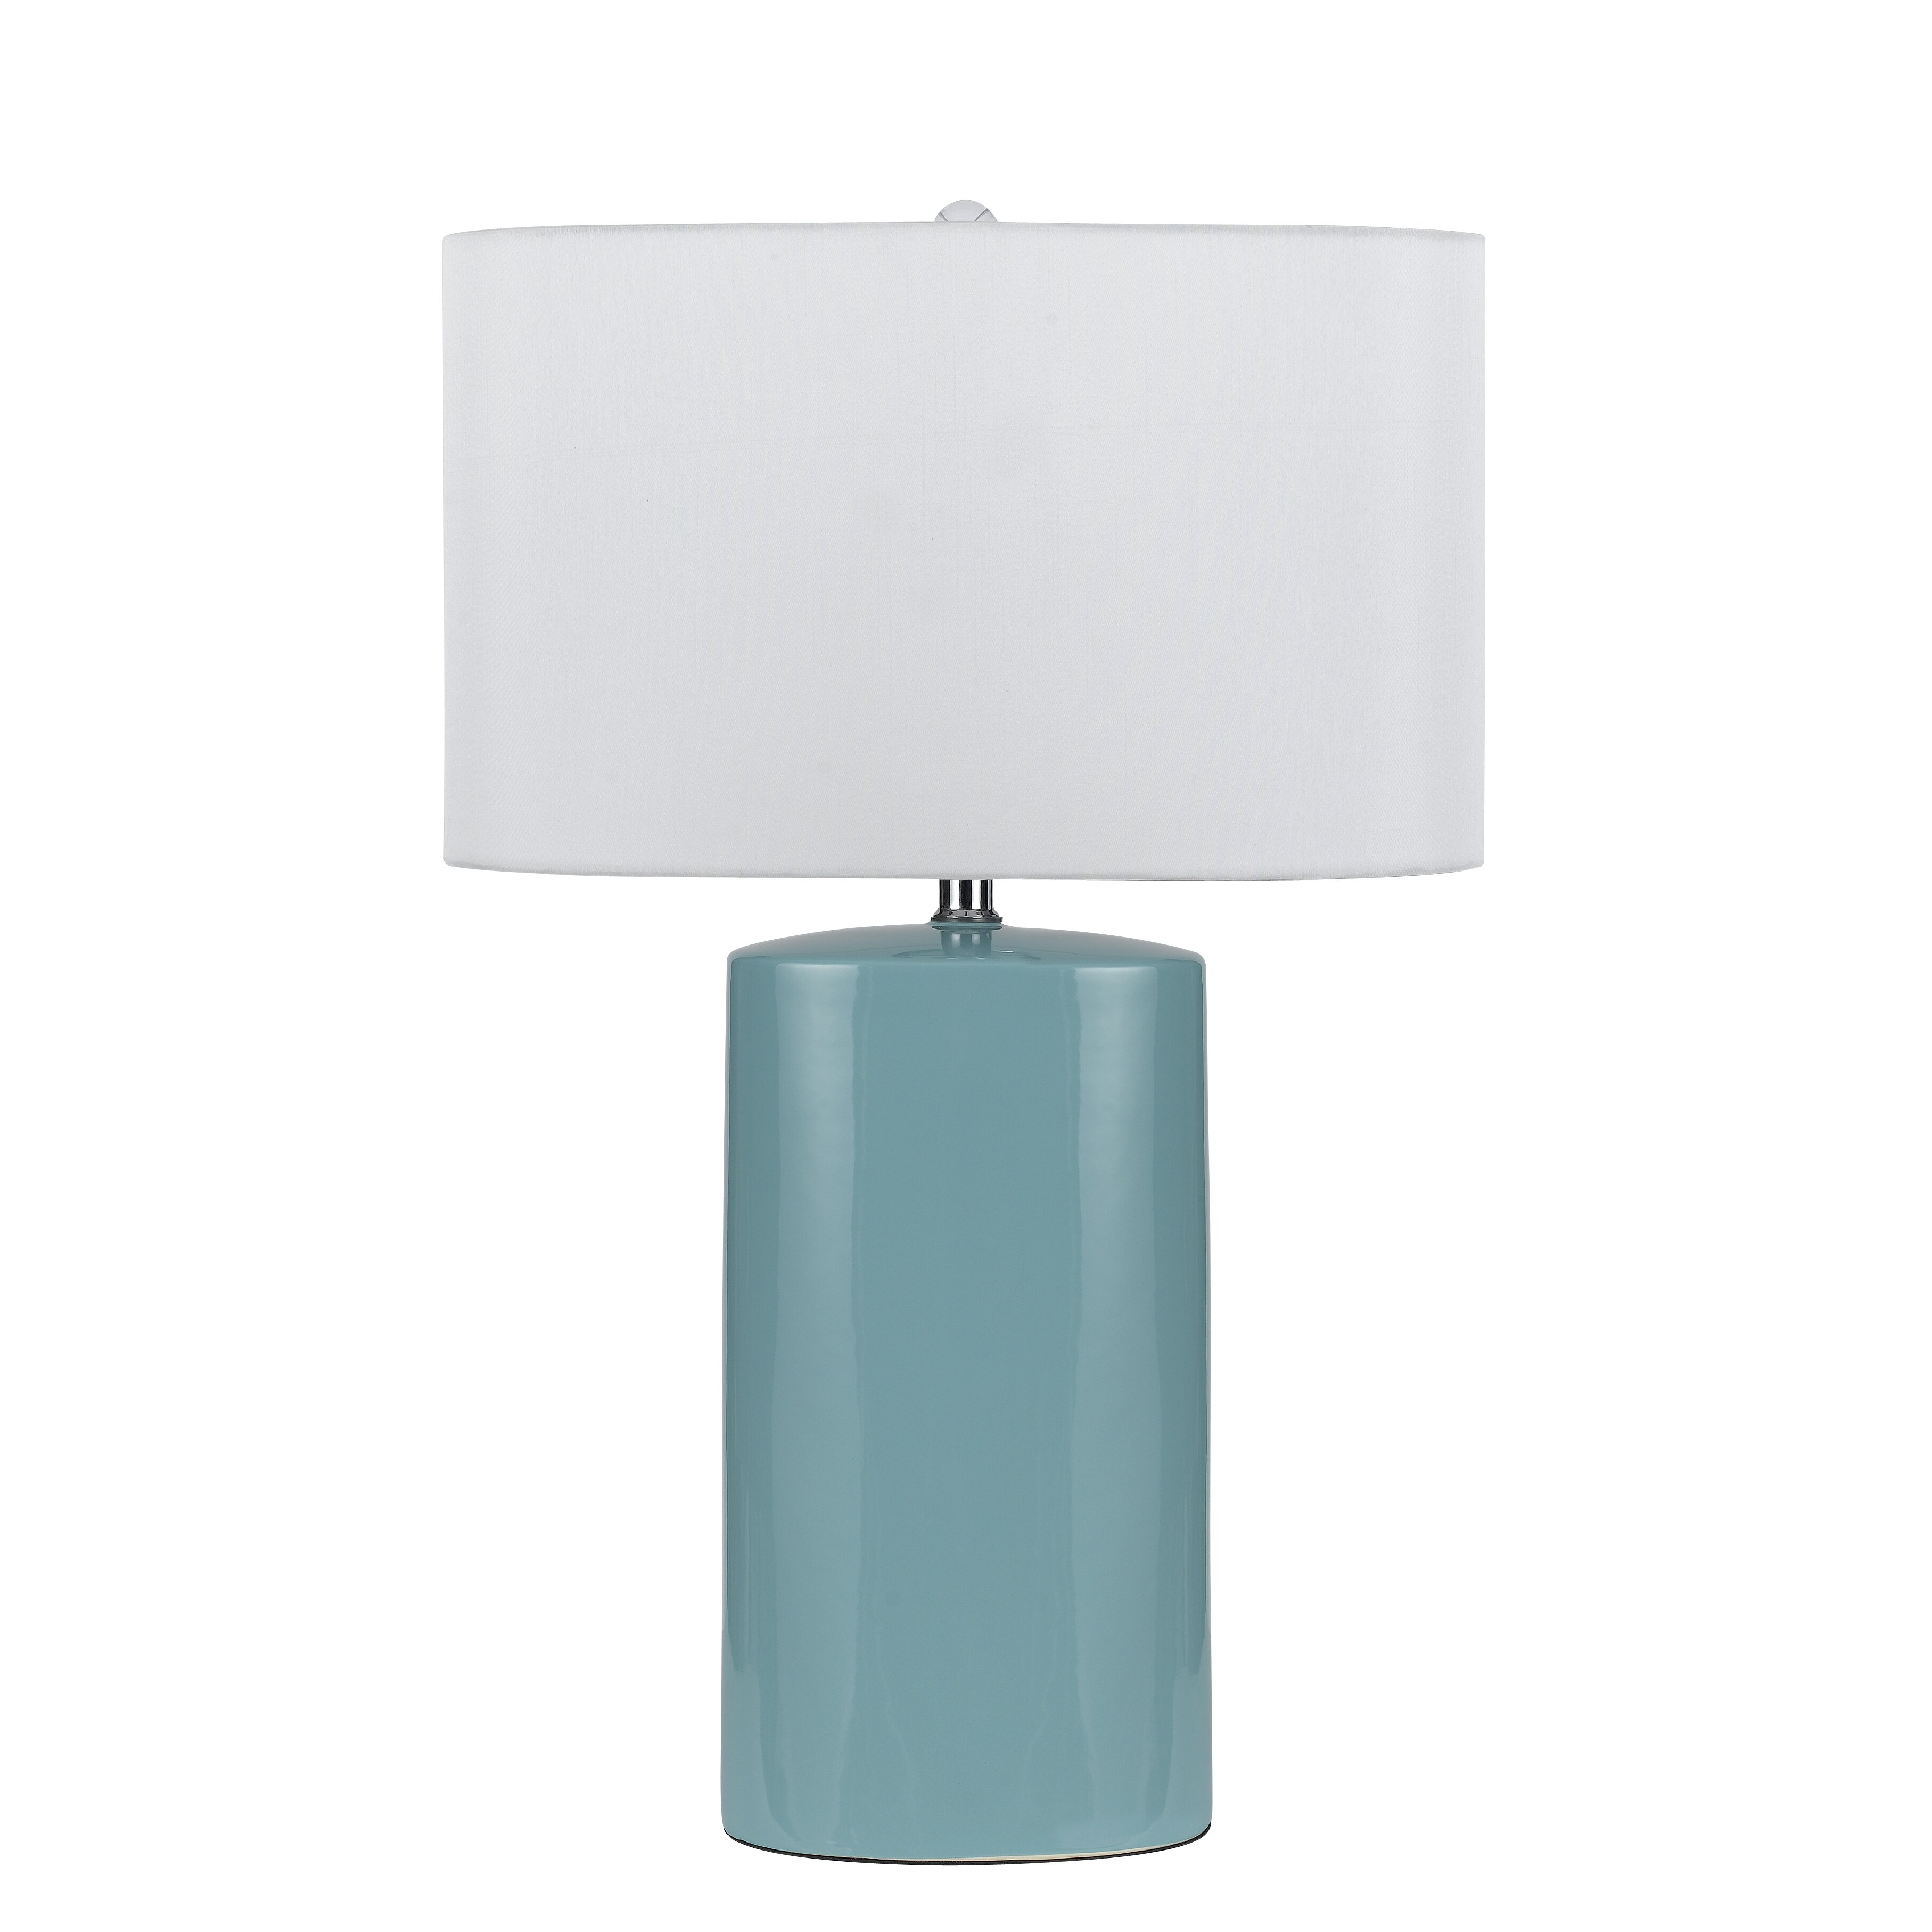 lighting lamps table lamps cal lighting sku cg2227. Black Bedroom Furniture Sets. Home Design Ideas